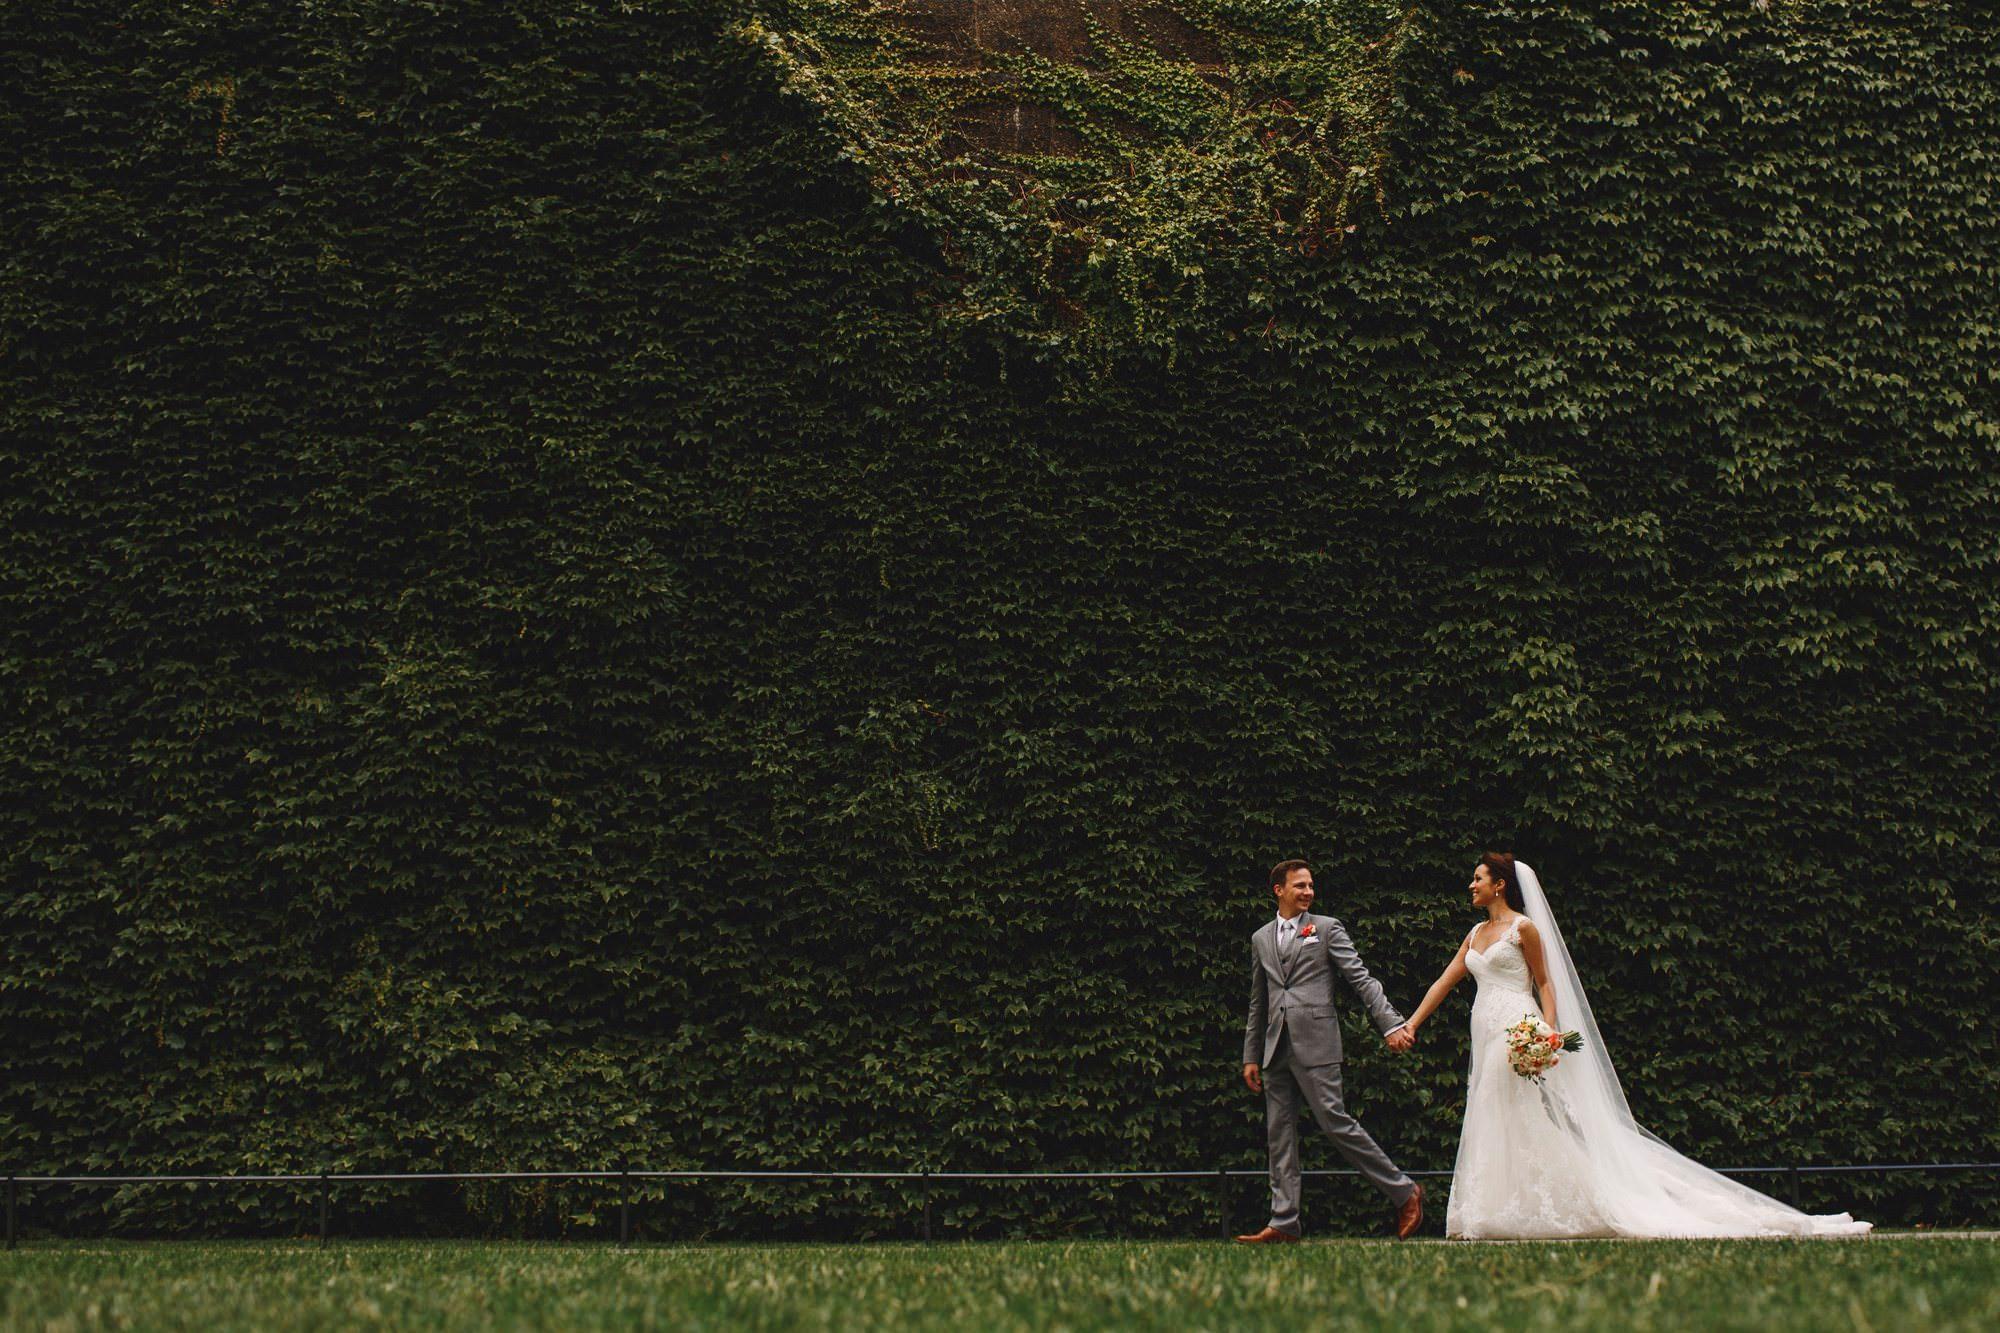 Carlton house terrace wedding photographer london 01